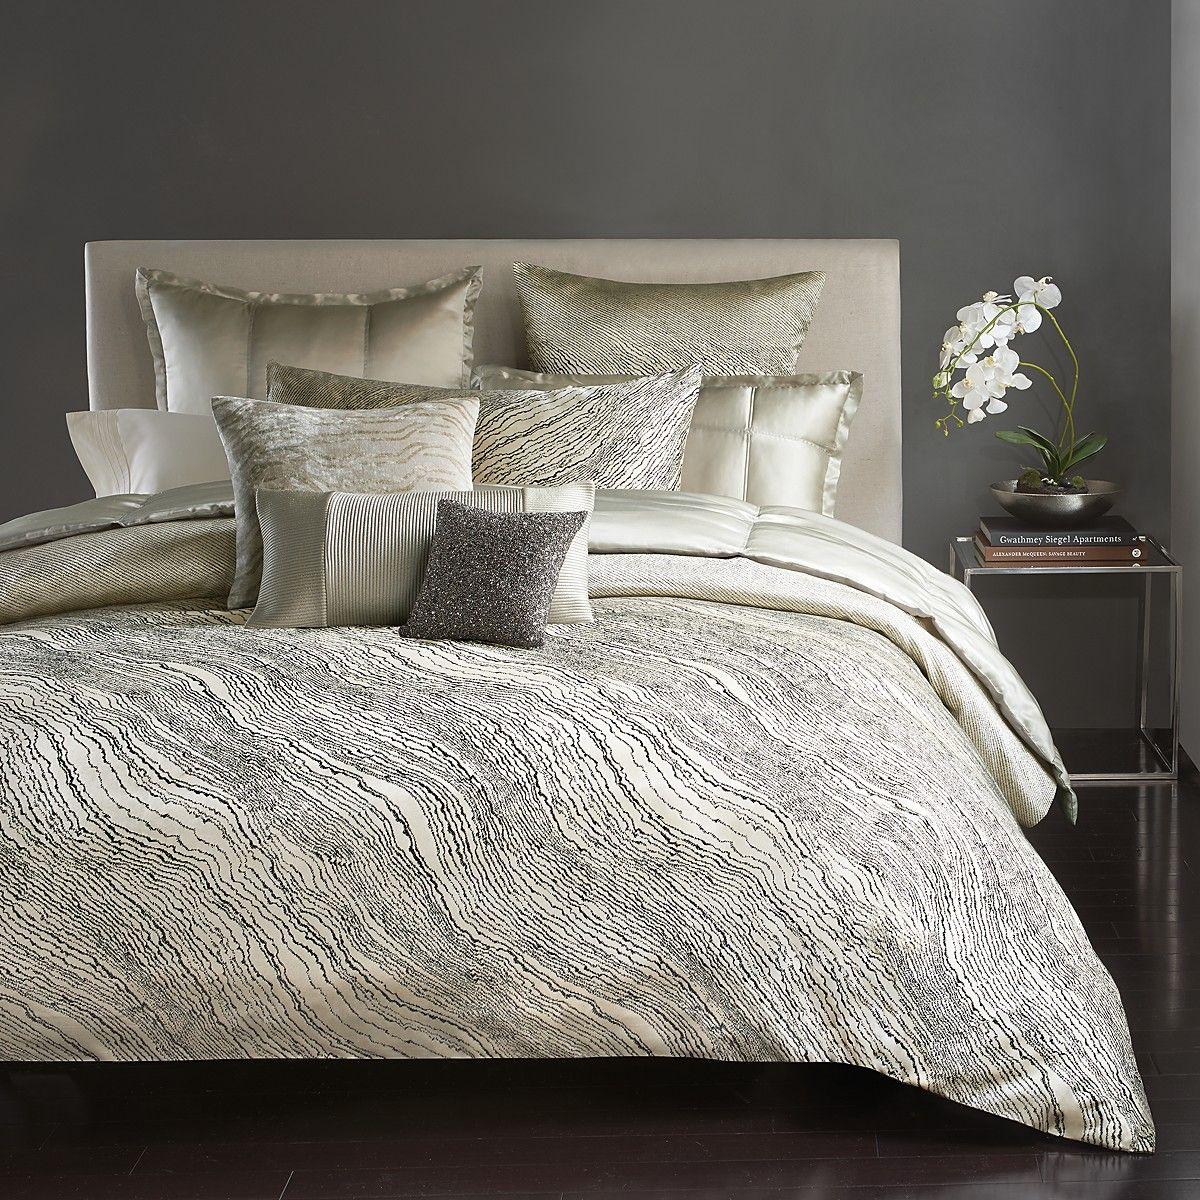 bloomingdales queen lush tokida piece sets boho tangerine comforter comforters stripe turquoise decor shop for